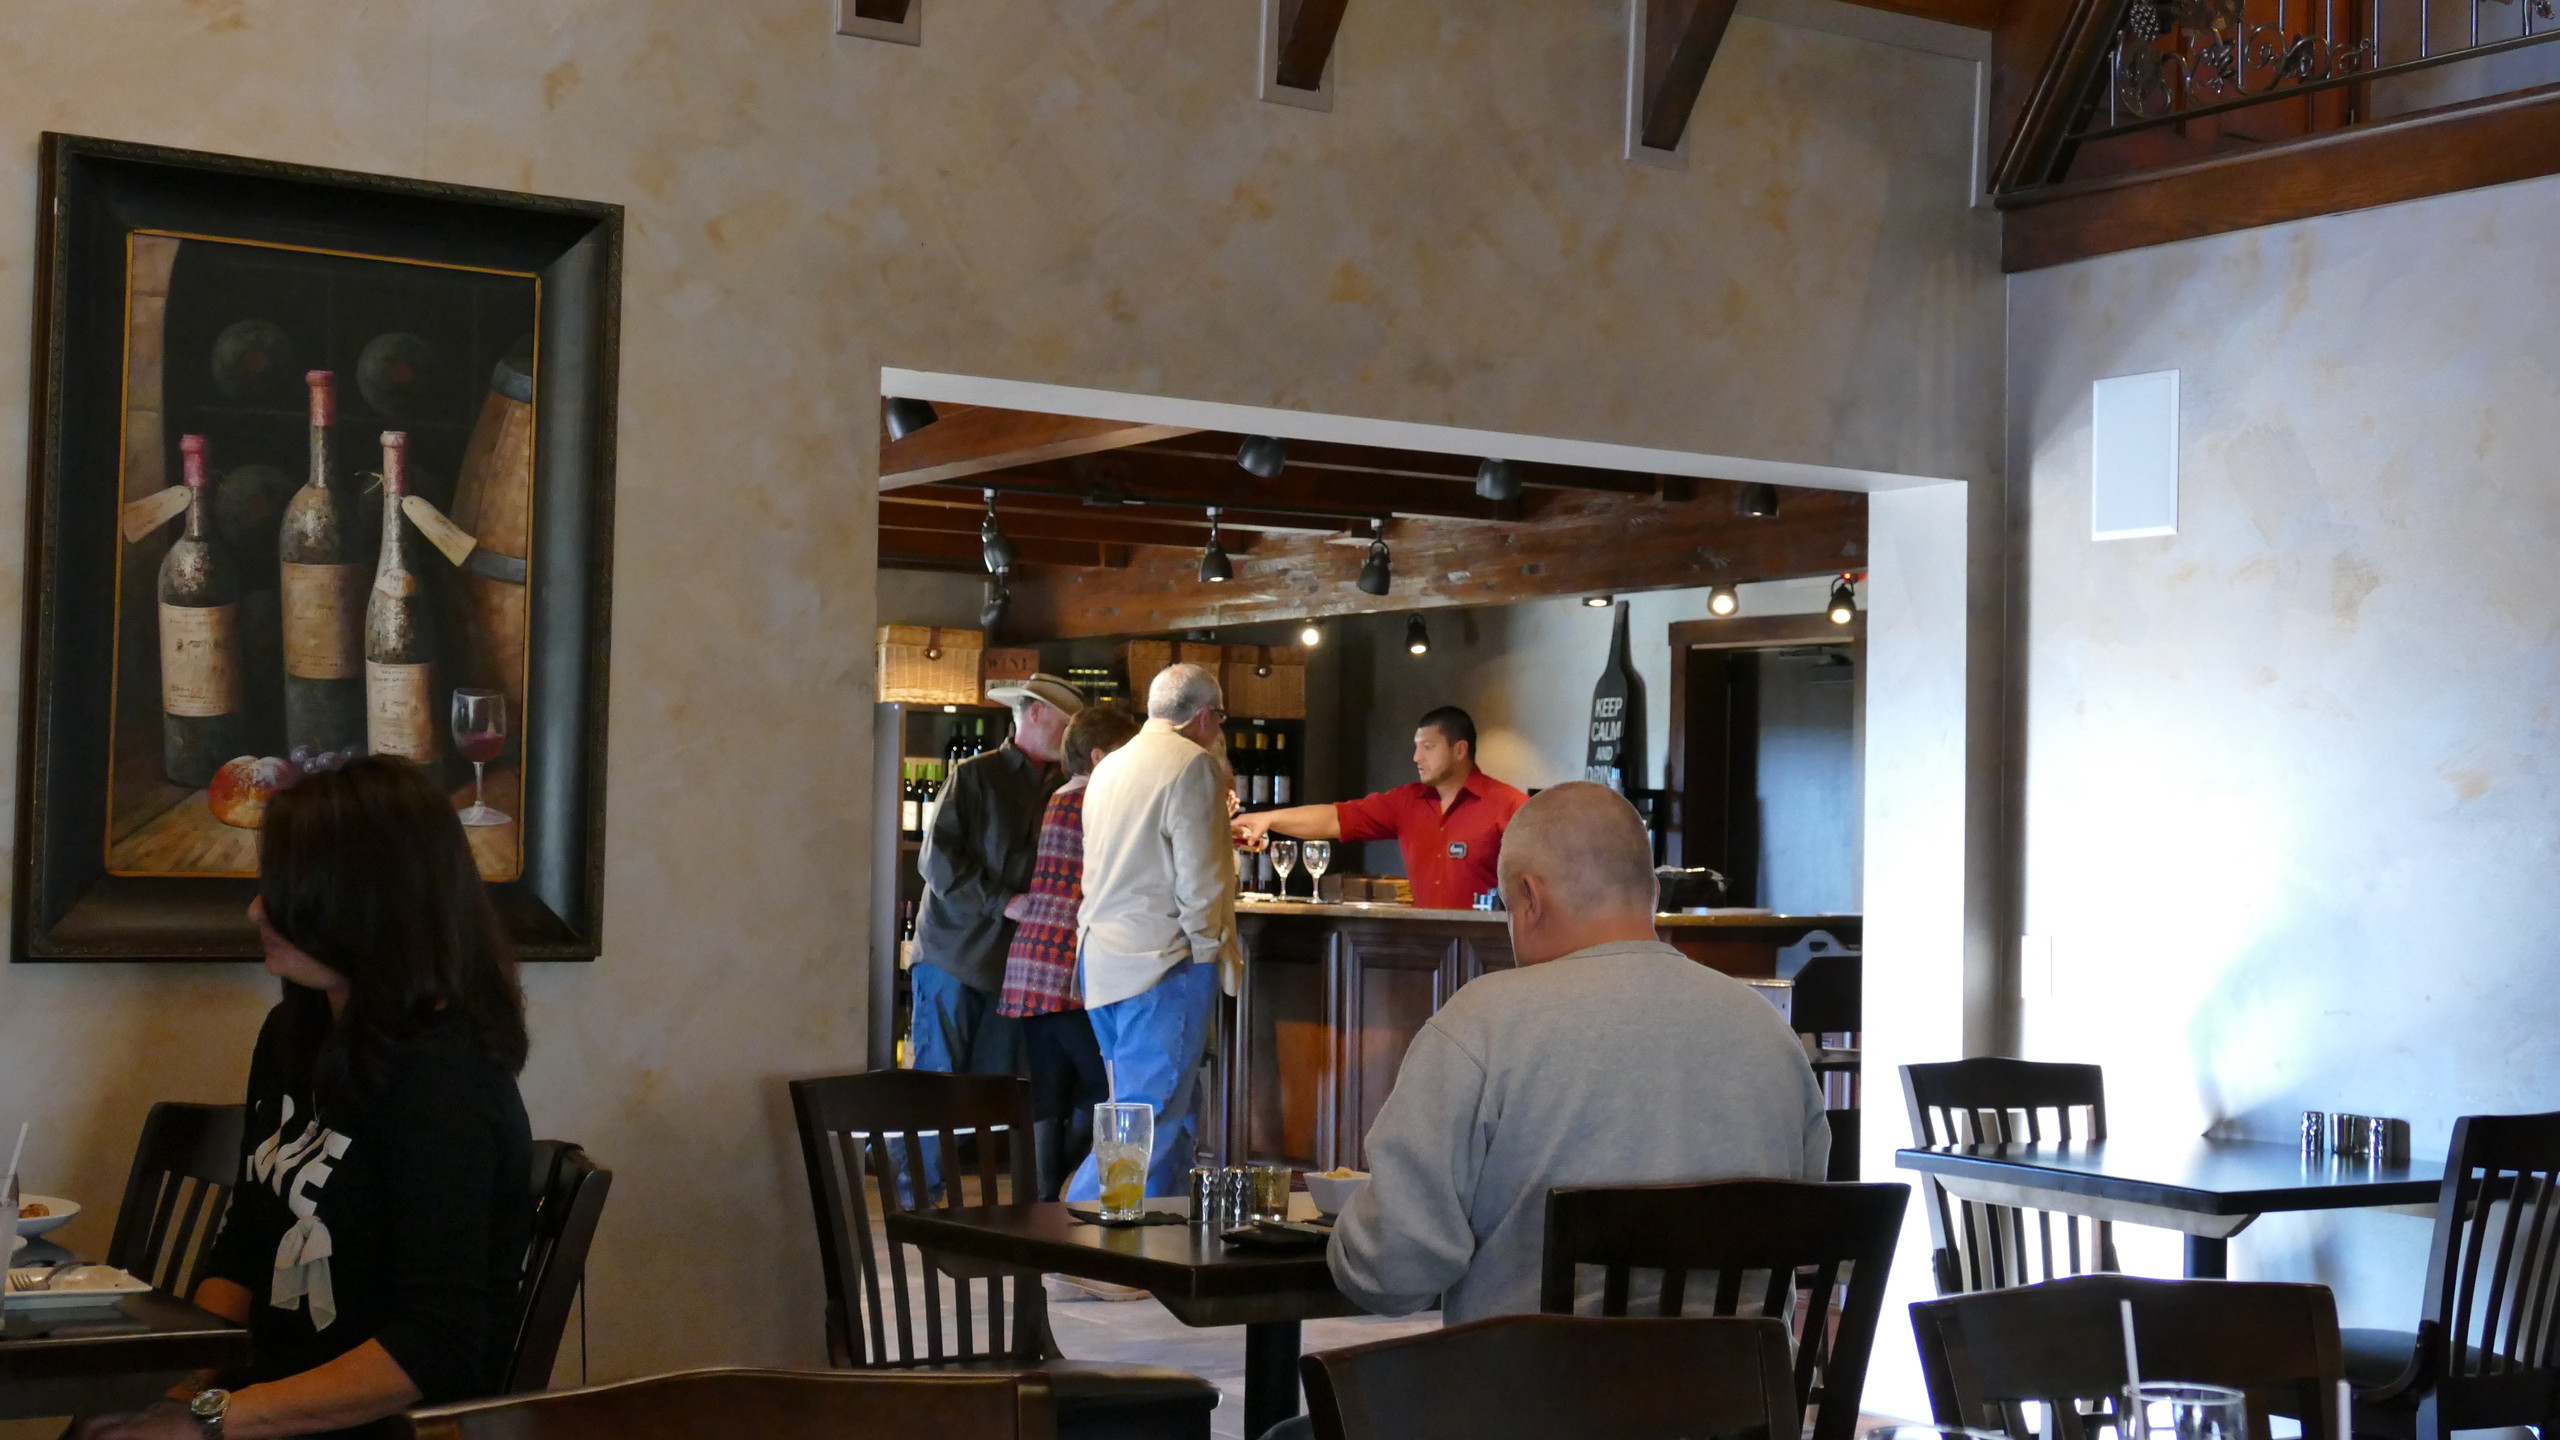 Herrera Restaurant & Bar